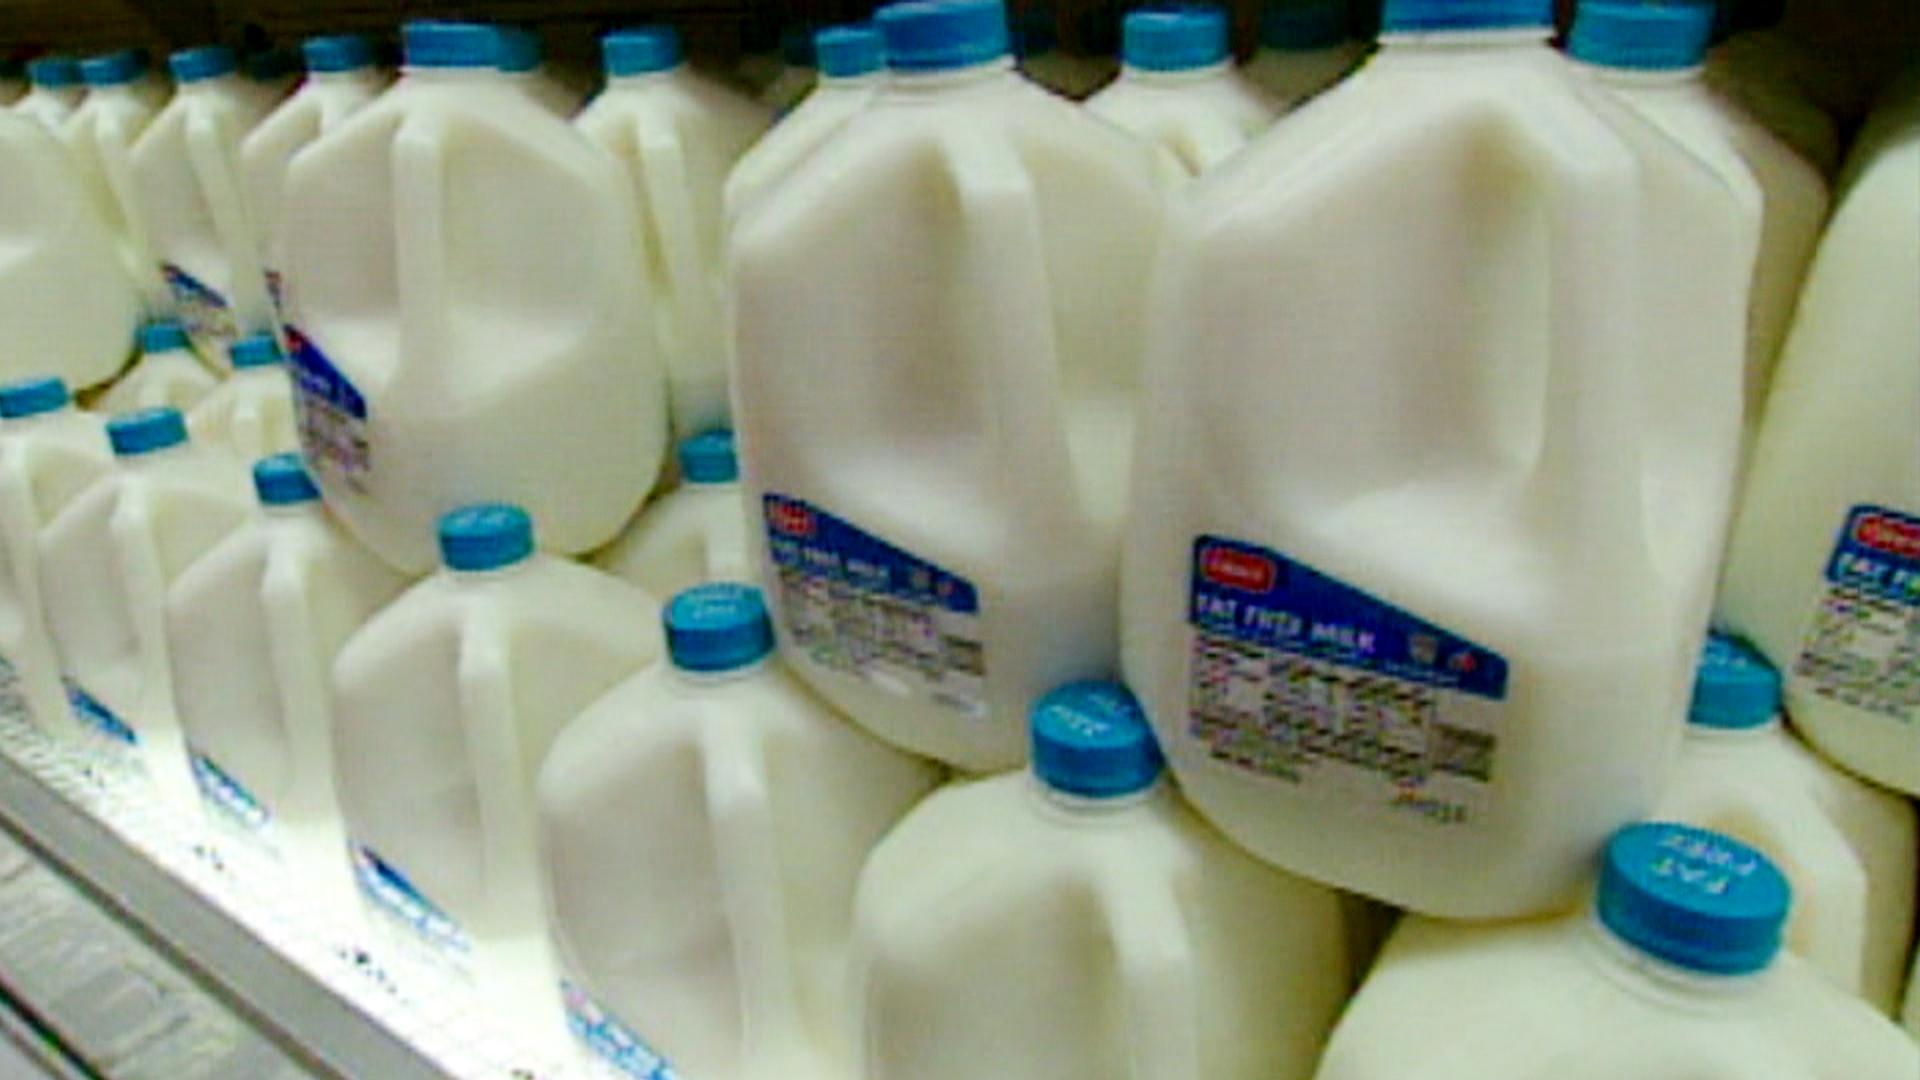 Could a2 Milk Solve Lactose Intolerance Symptoms For Some?